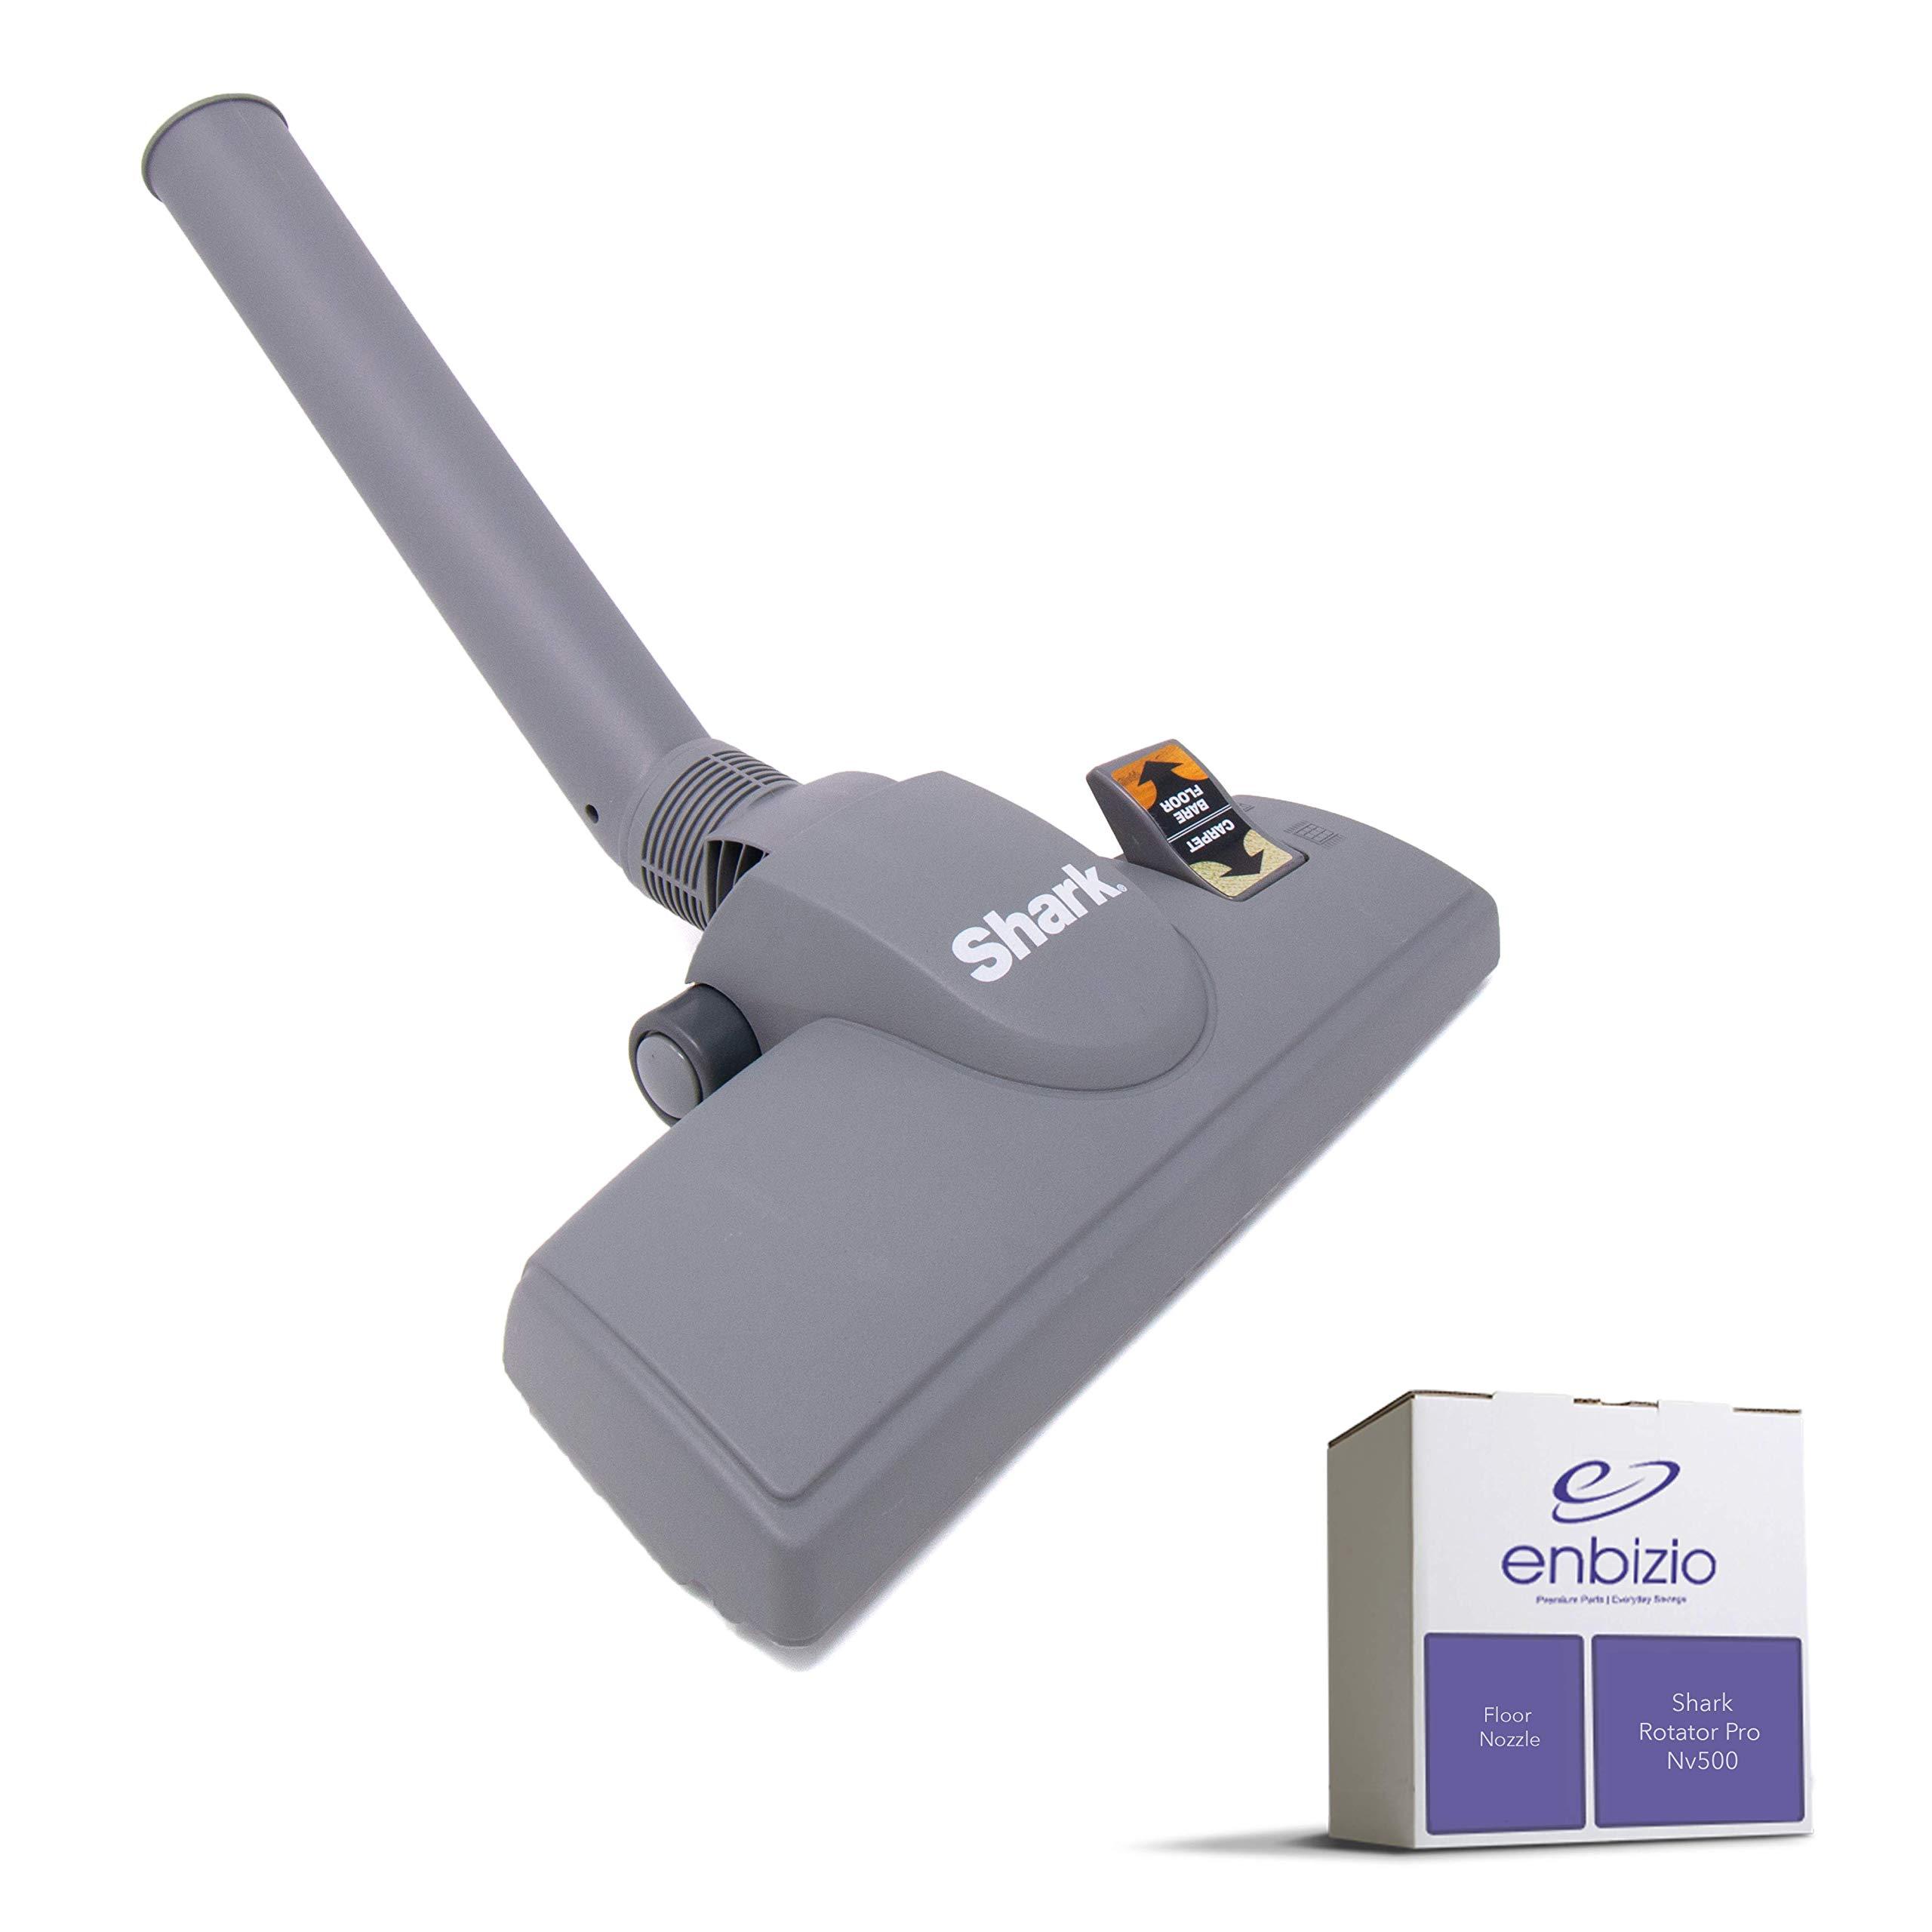 Enbizio - Premium Vacuum Replacement Parts for Shark Rotator Upright Professional Lift Away Nv500 Nv501 Nv502 -  Floor Nozzle Dust Away Brush Tool Attachment - Dark Grey  XSN500 by Enbizio